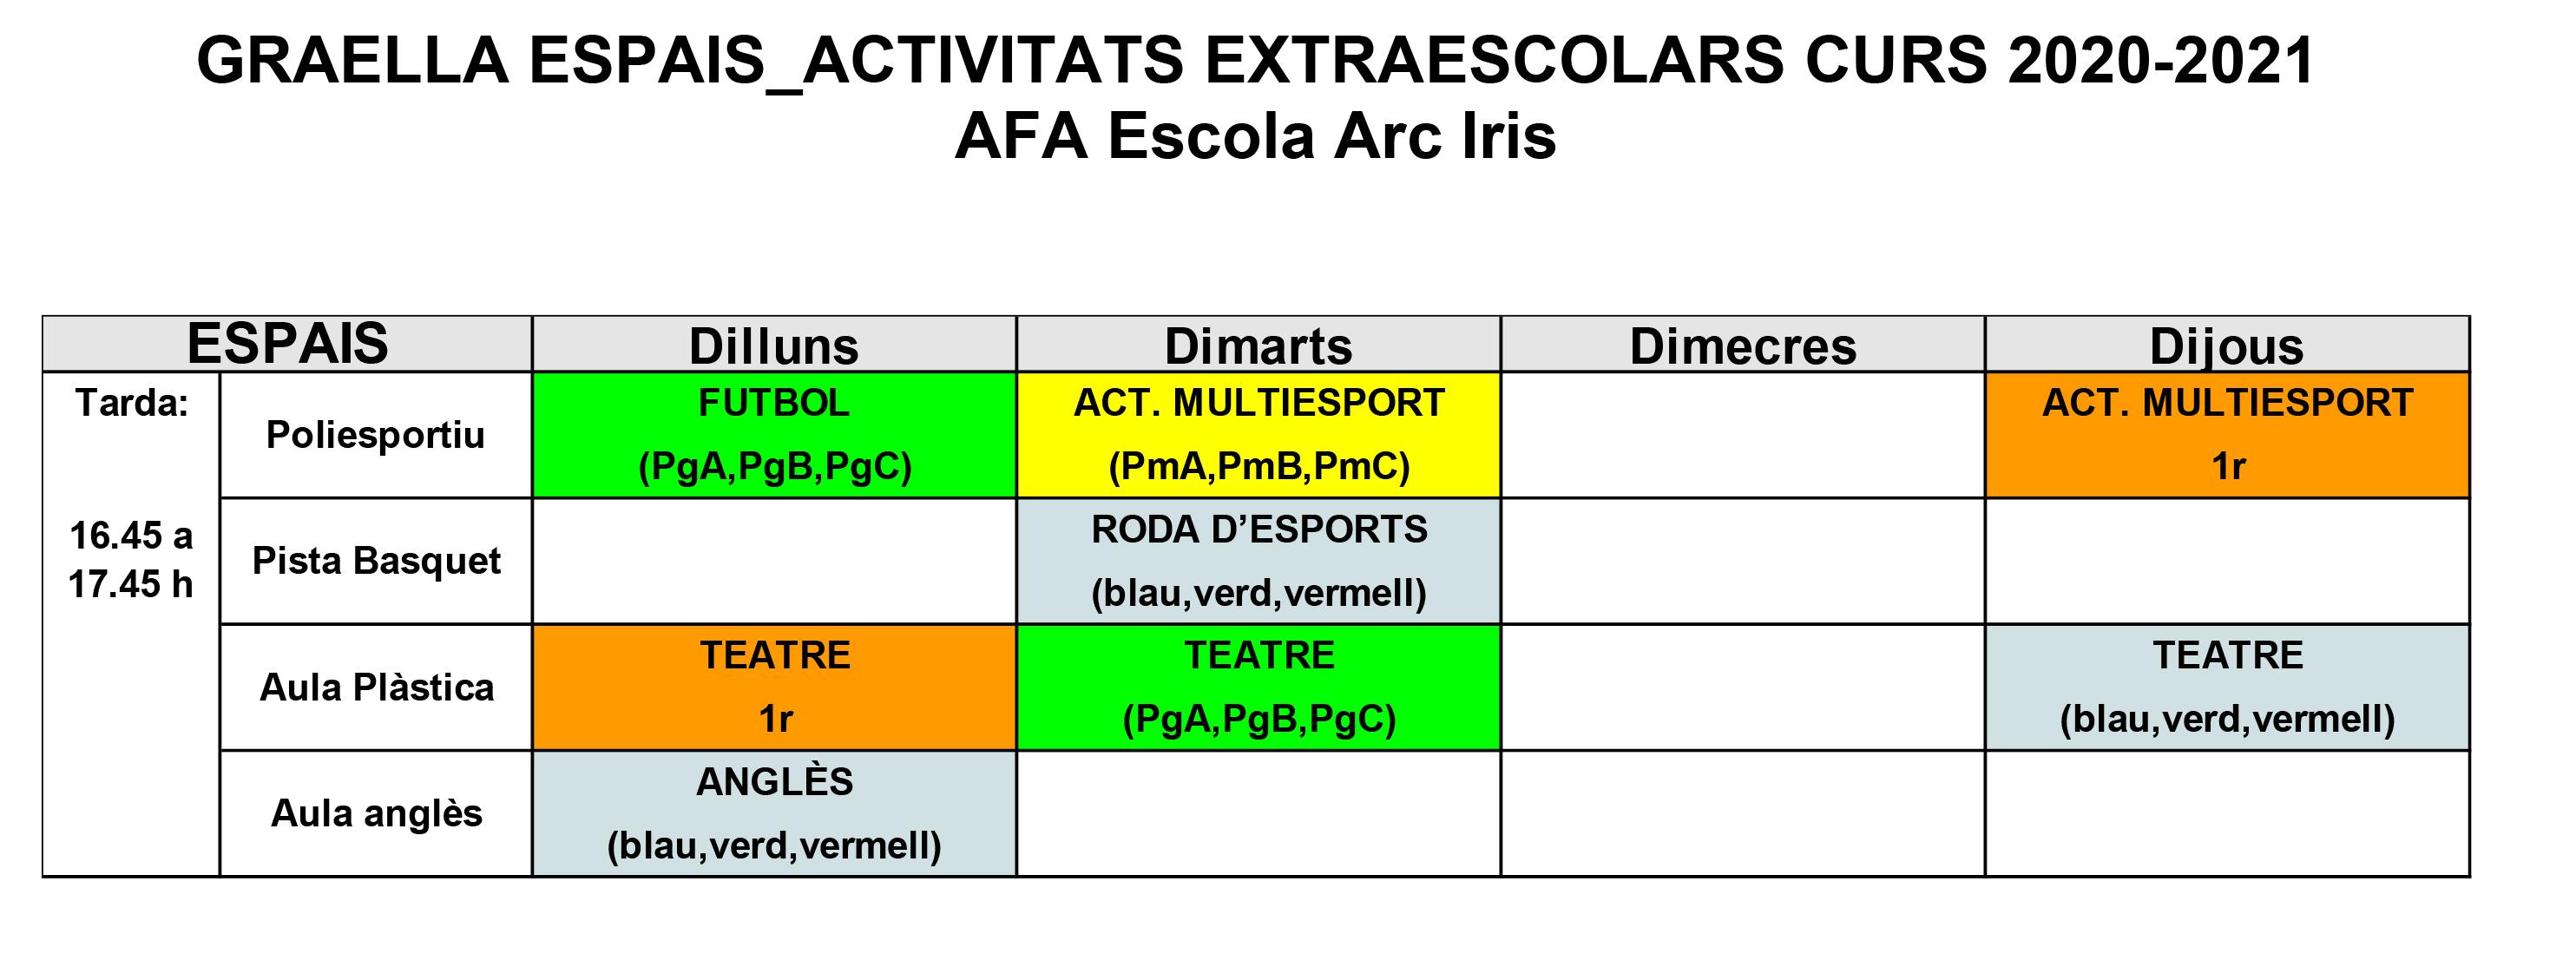 Microsoft Word - GRAELLA_EXTRAESC_ESPAIS_EDATS_2020_2021 _COVID.